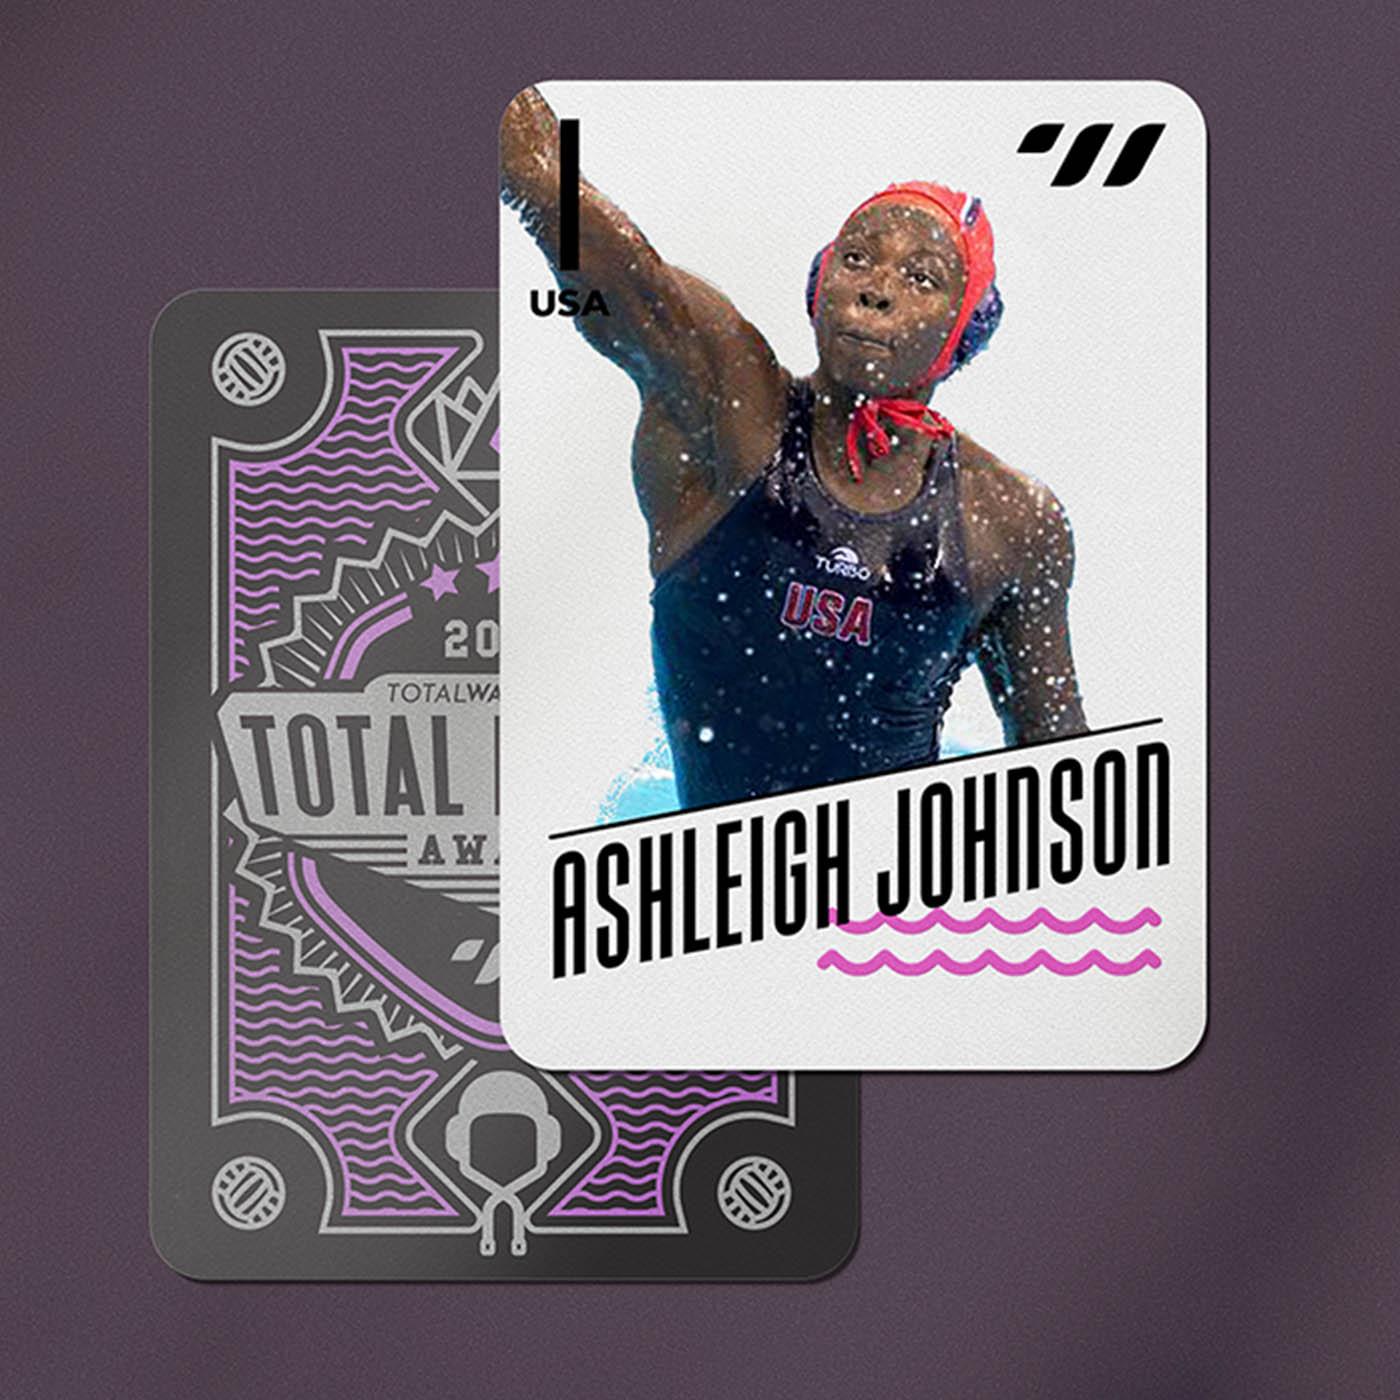 GOALKEEPER - Ashleigh Johnson (USA)